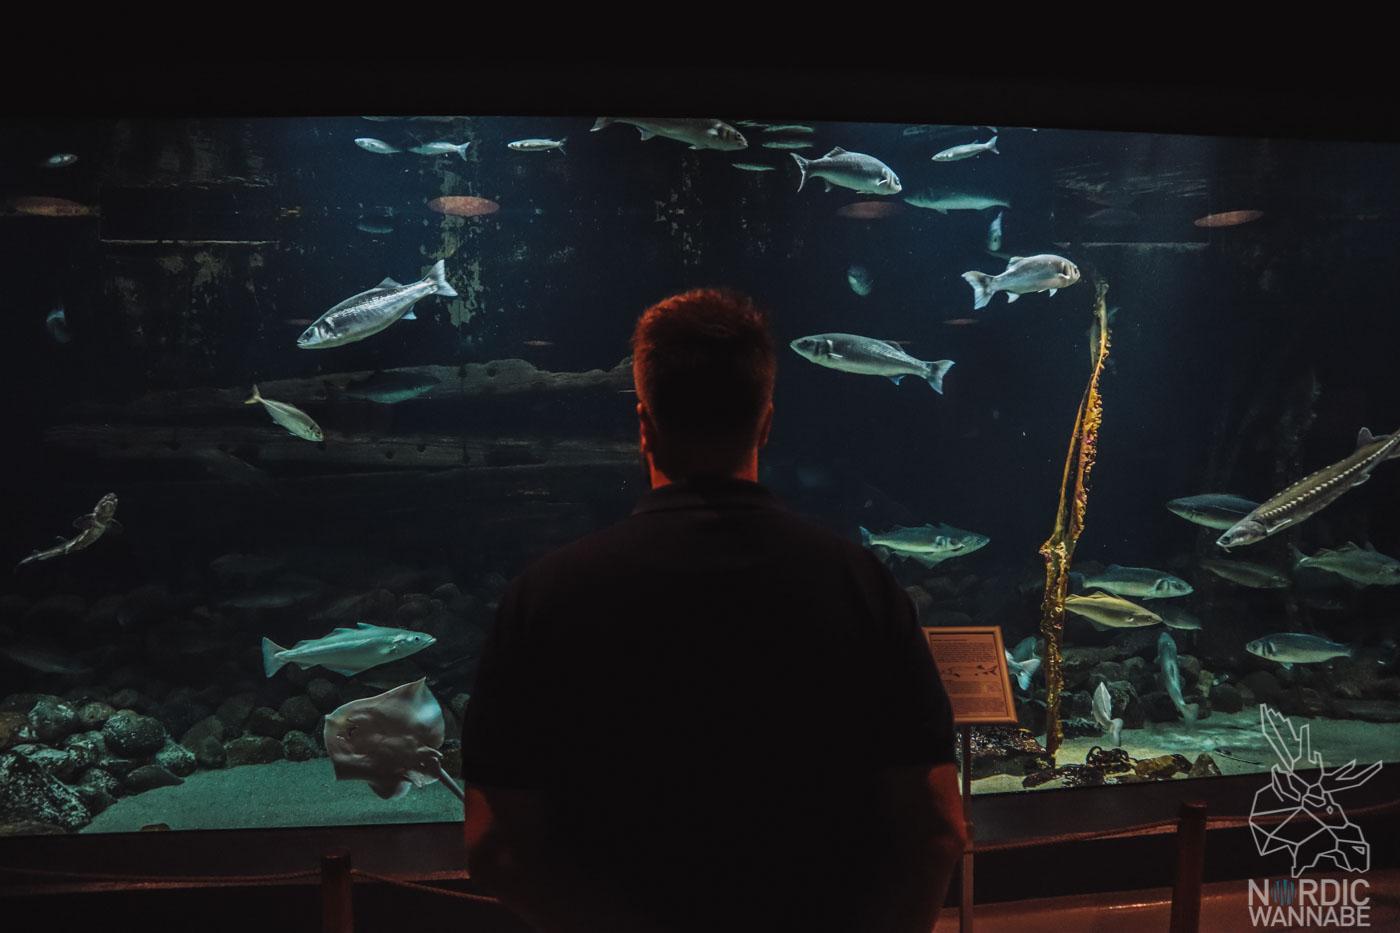 Esbjerg, Dänemark, Süddänemark, Südjütland, Marine und Fischerei Museum